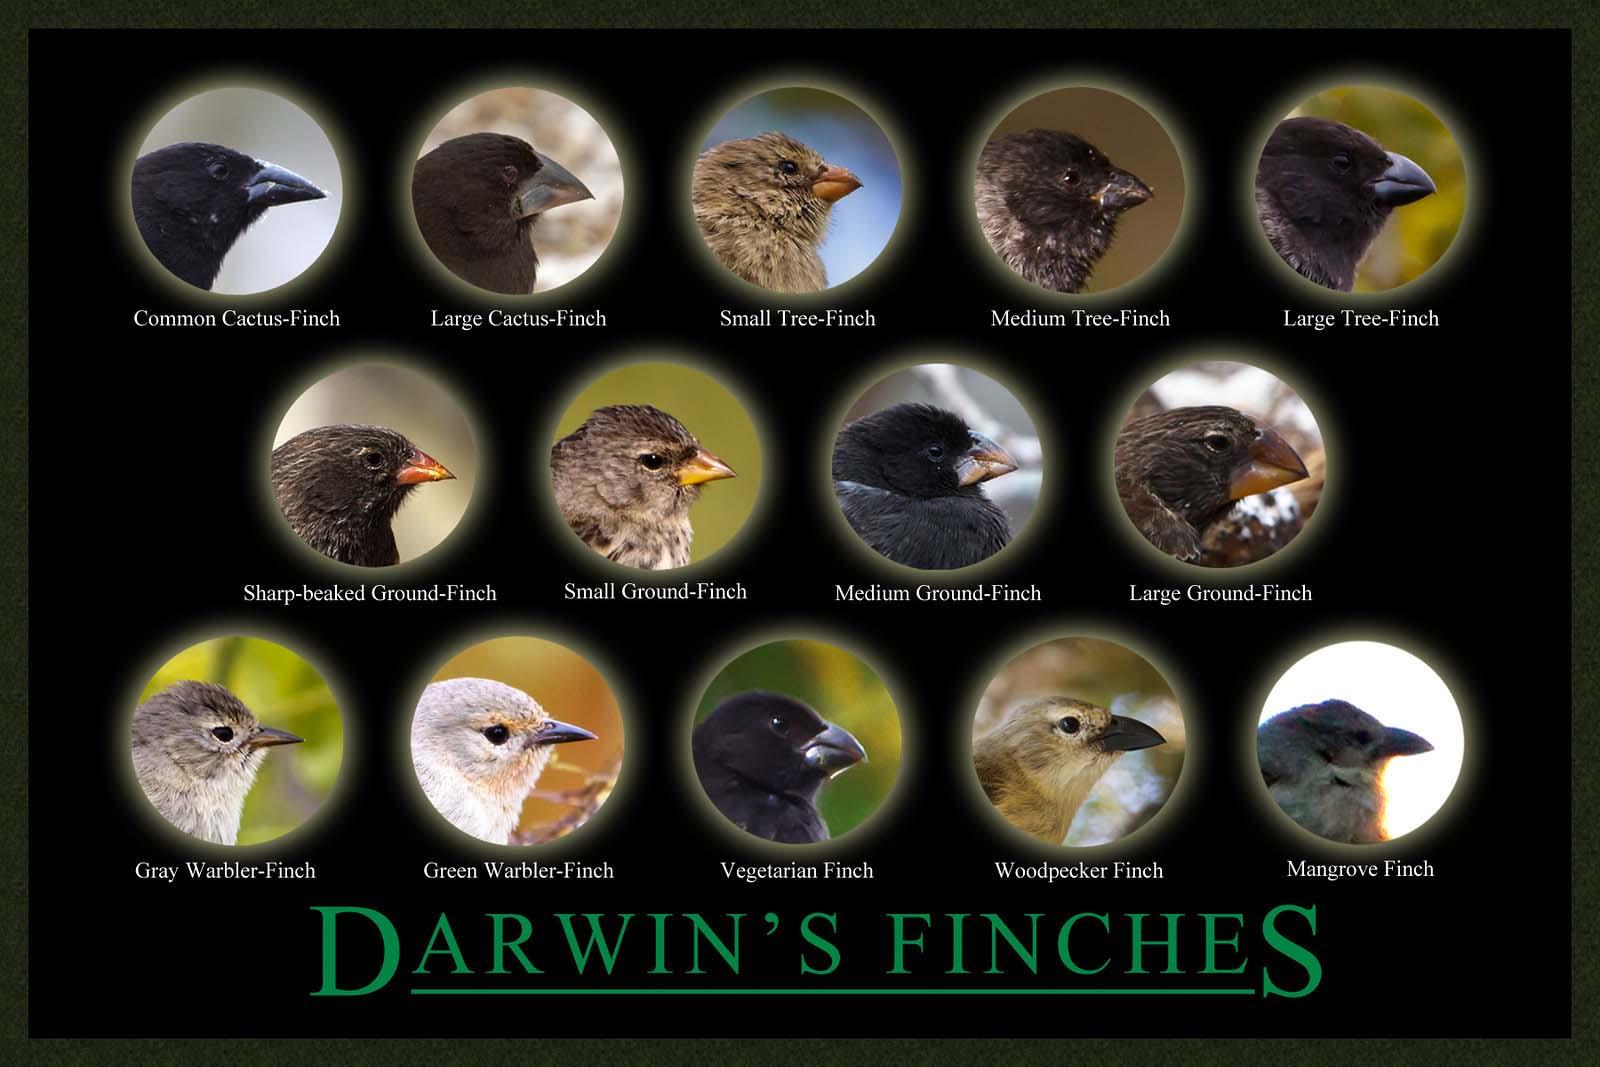 Darwin's Finches Galapagos